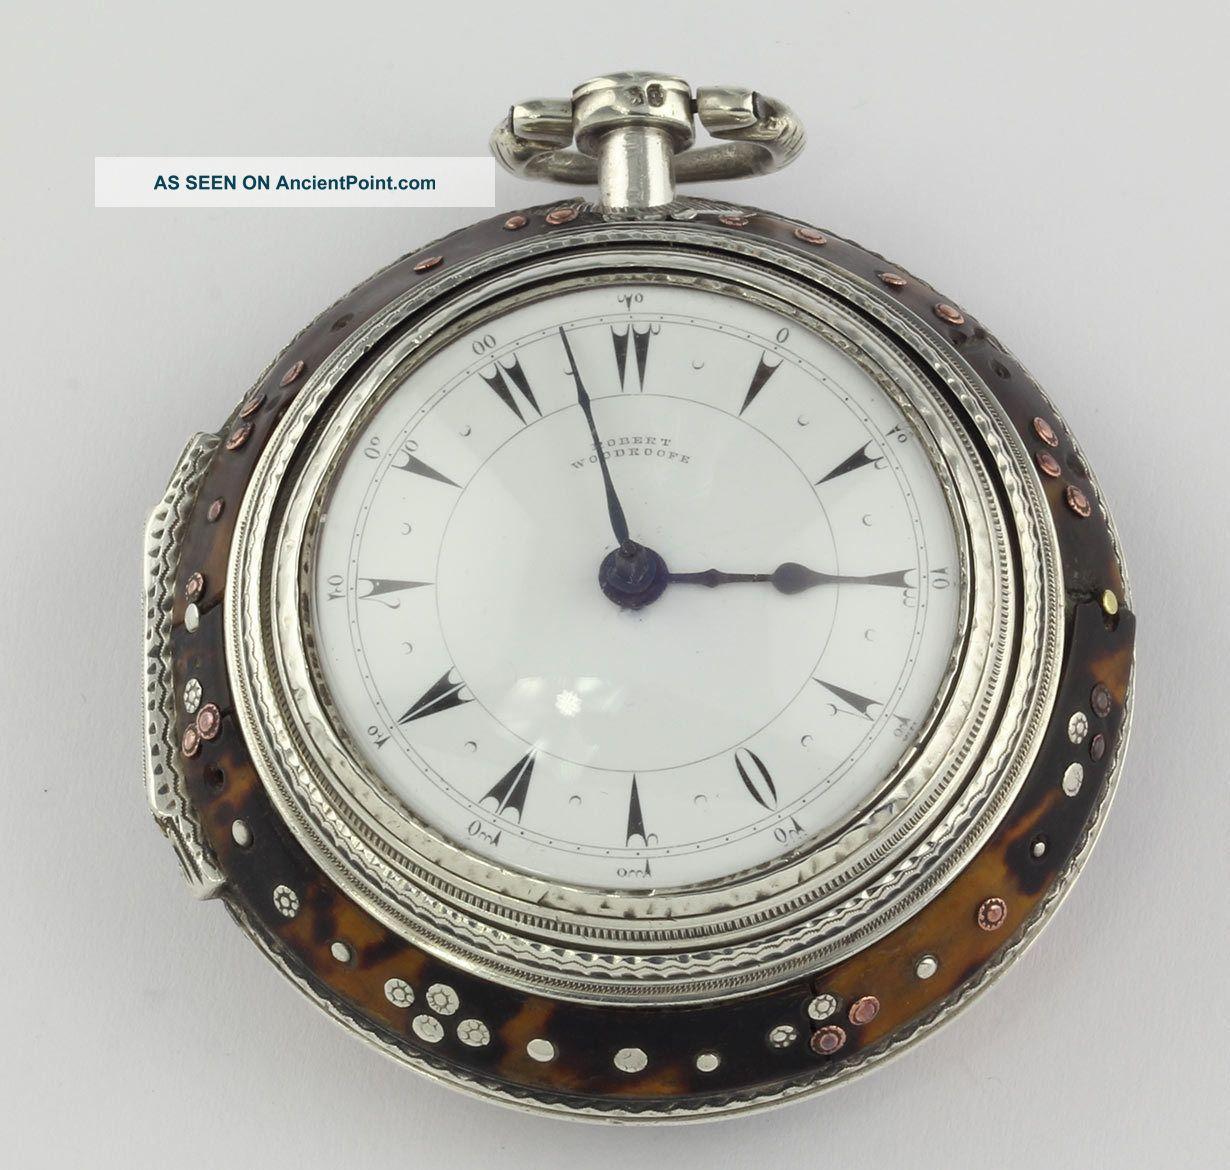 Osmanic Ottoman Triple Case Verge Fusee Pocket Watch 1798 Turkish Market Orient Near Eastern photo